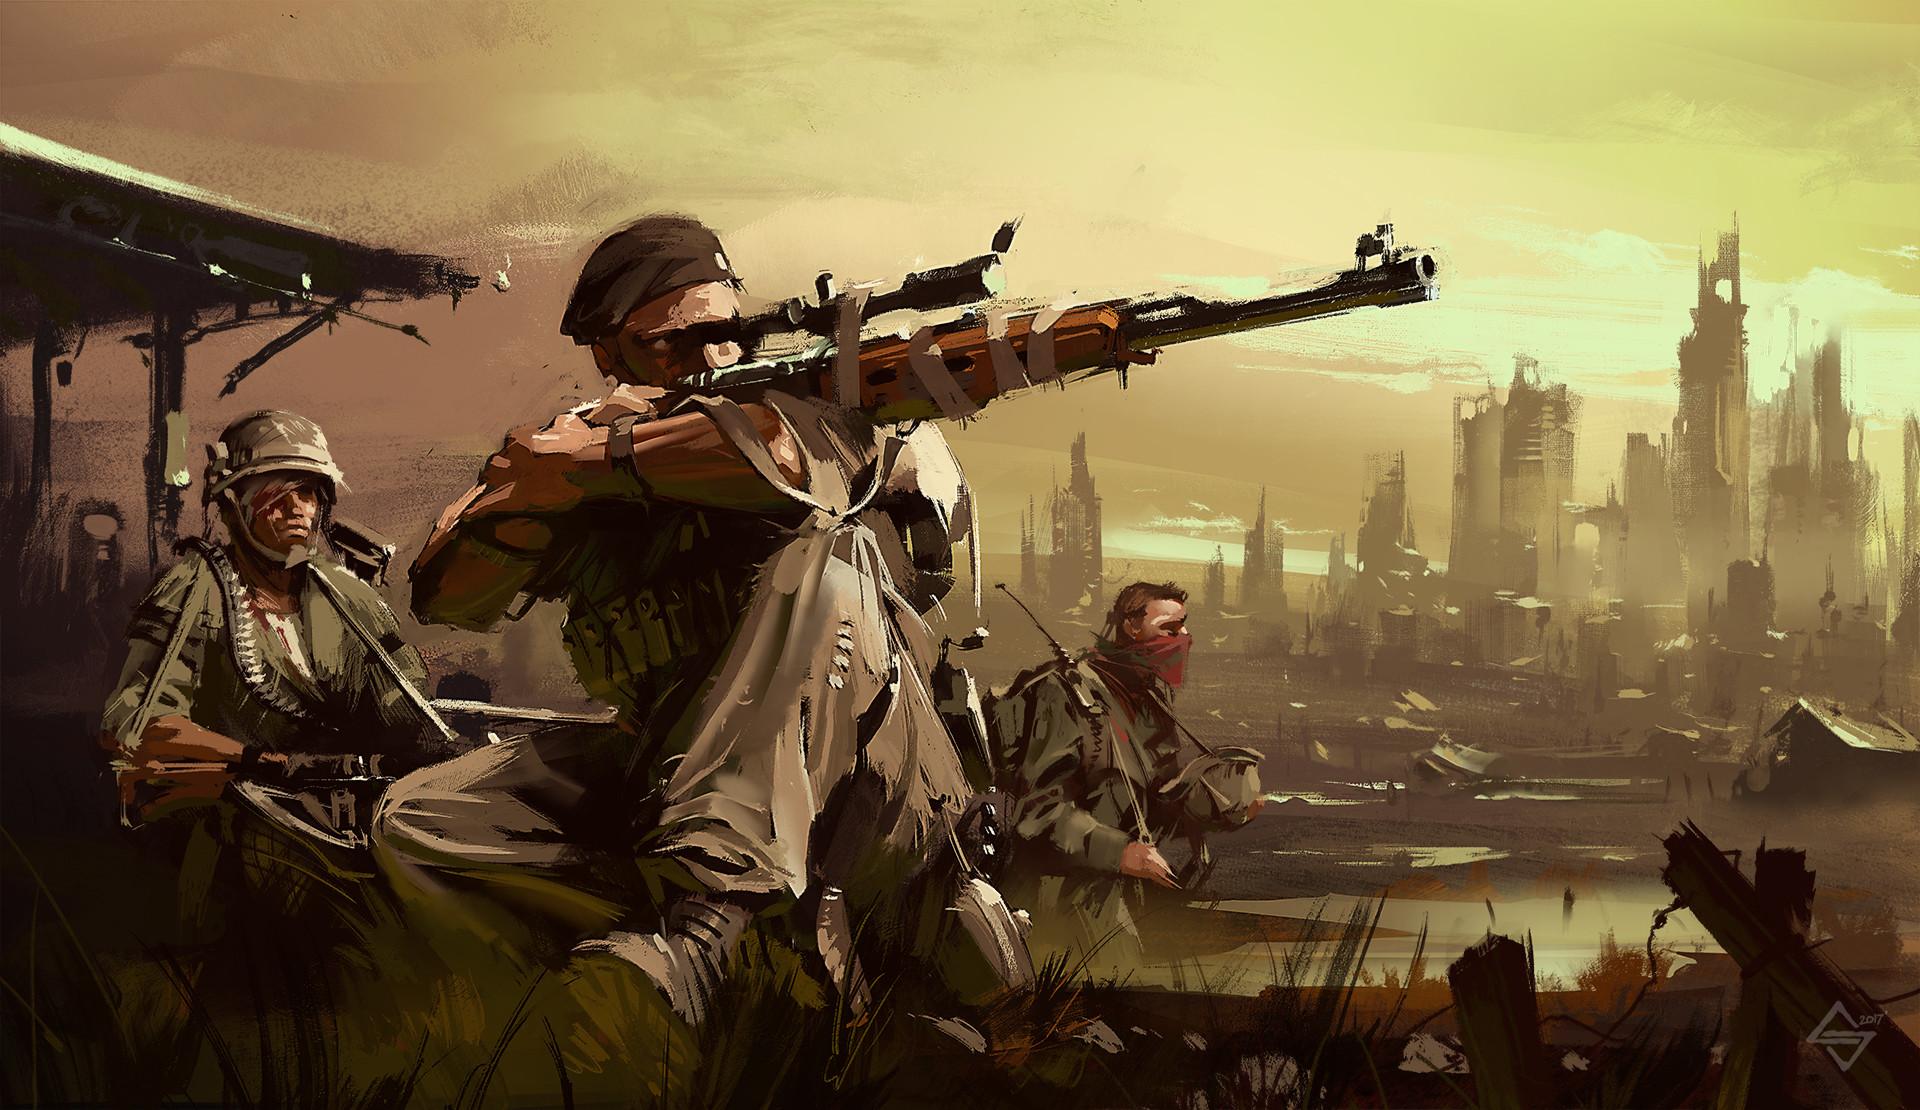 ArtStation - Fallout sniper, Michał Sztuka